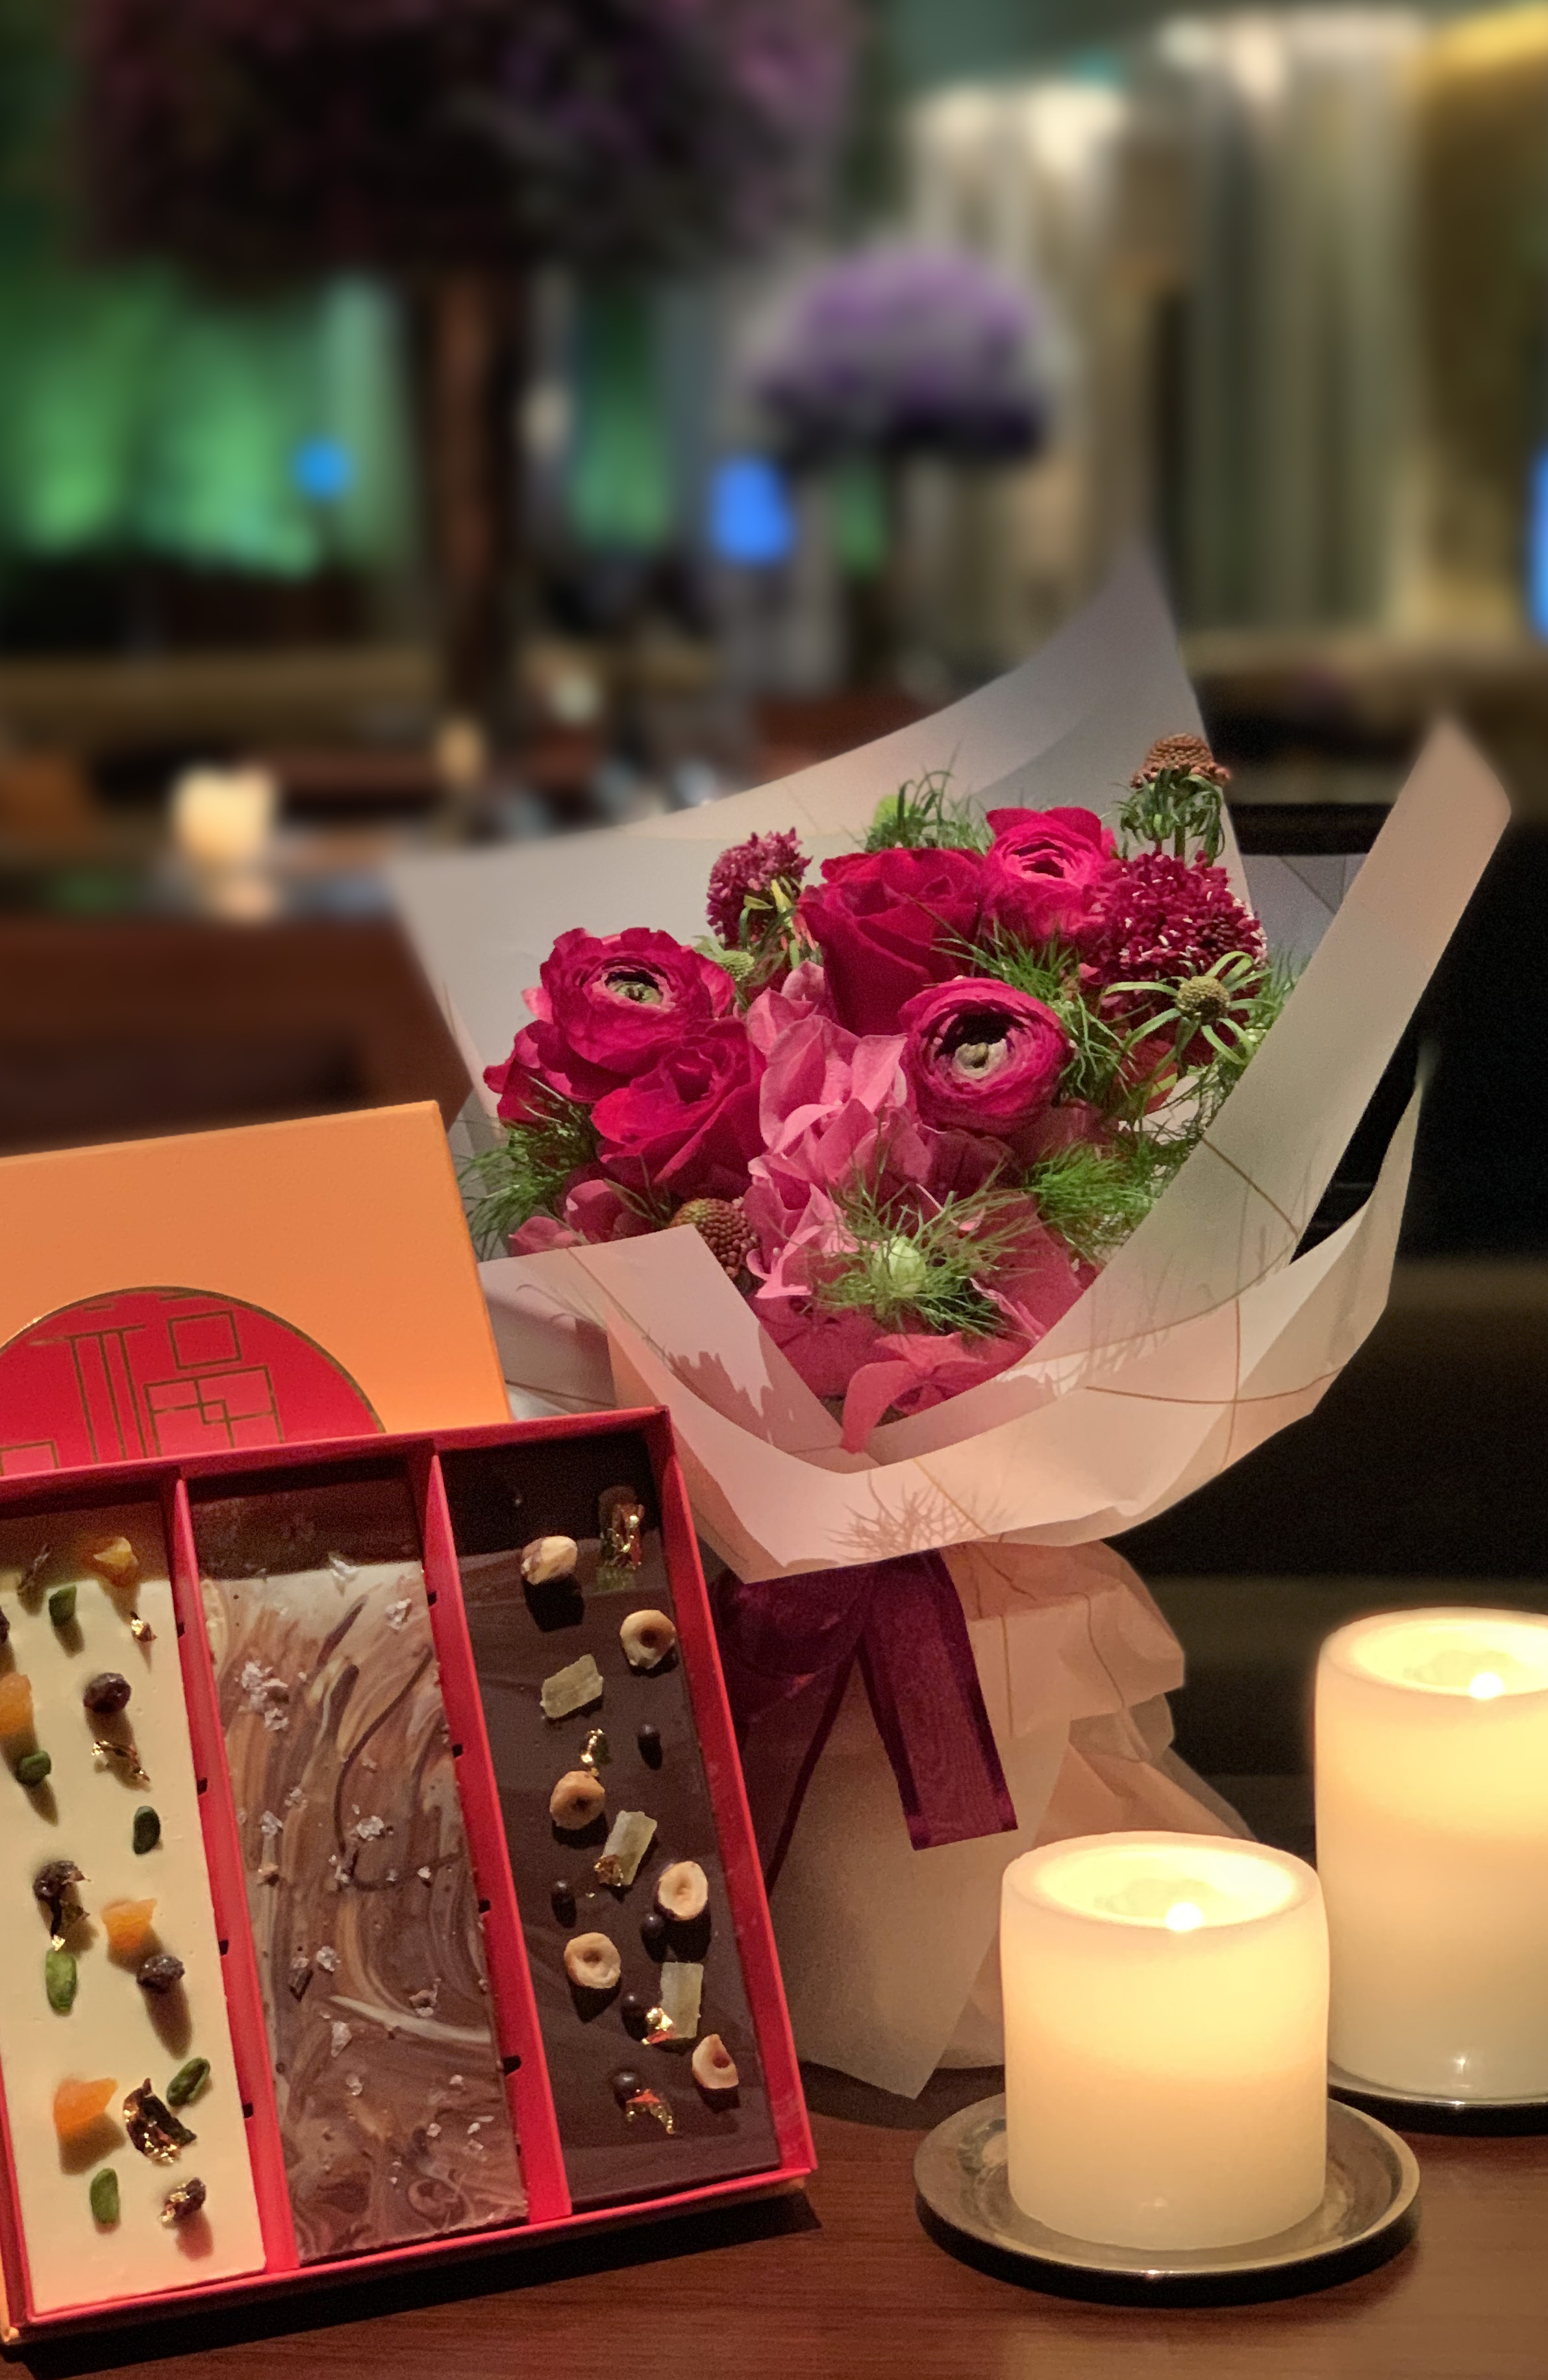 Valentines Gift Set at Grand Hyatt Macau